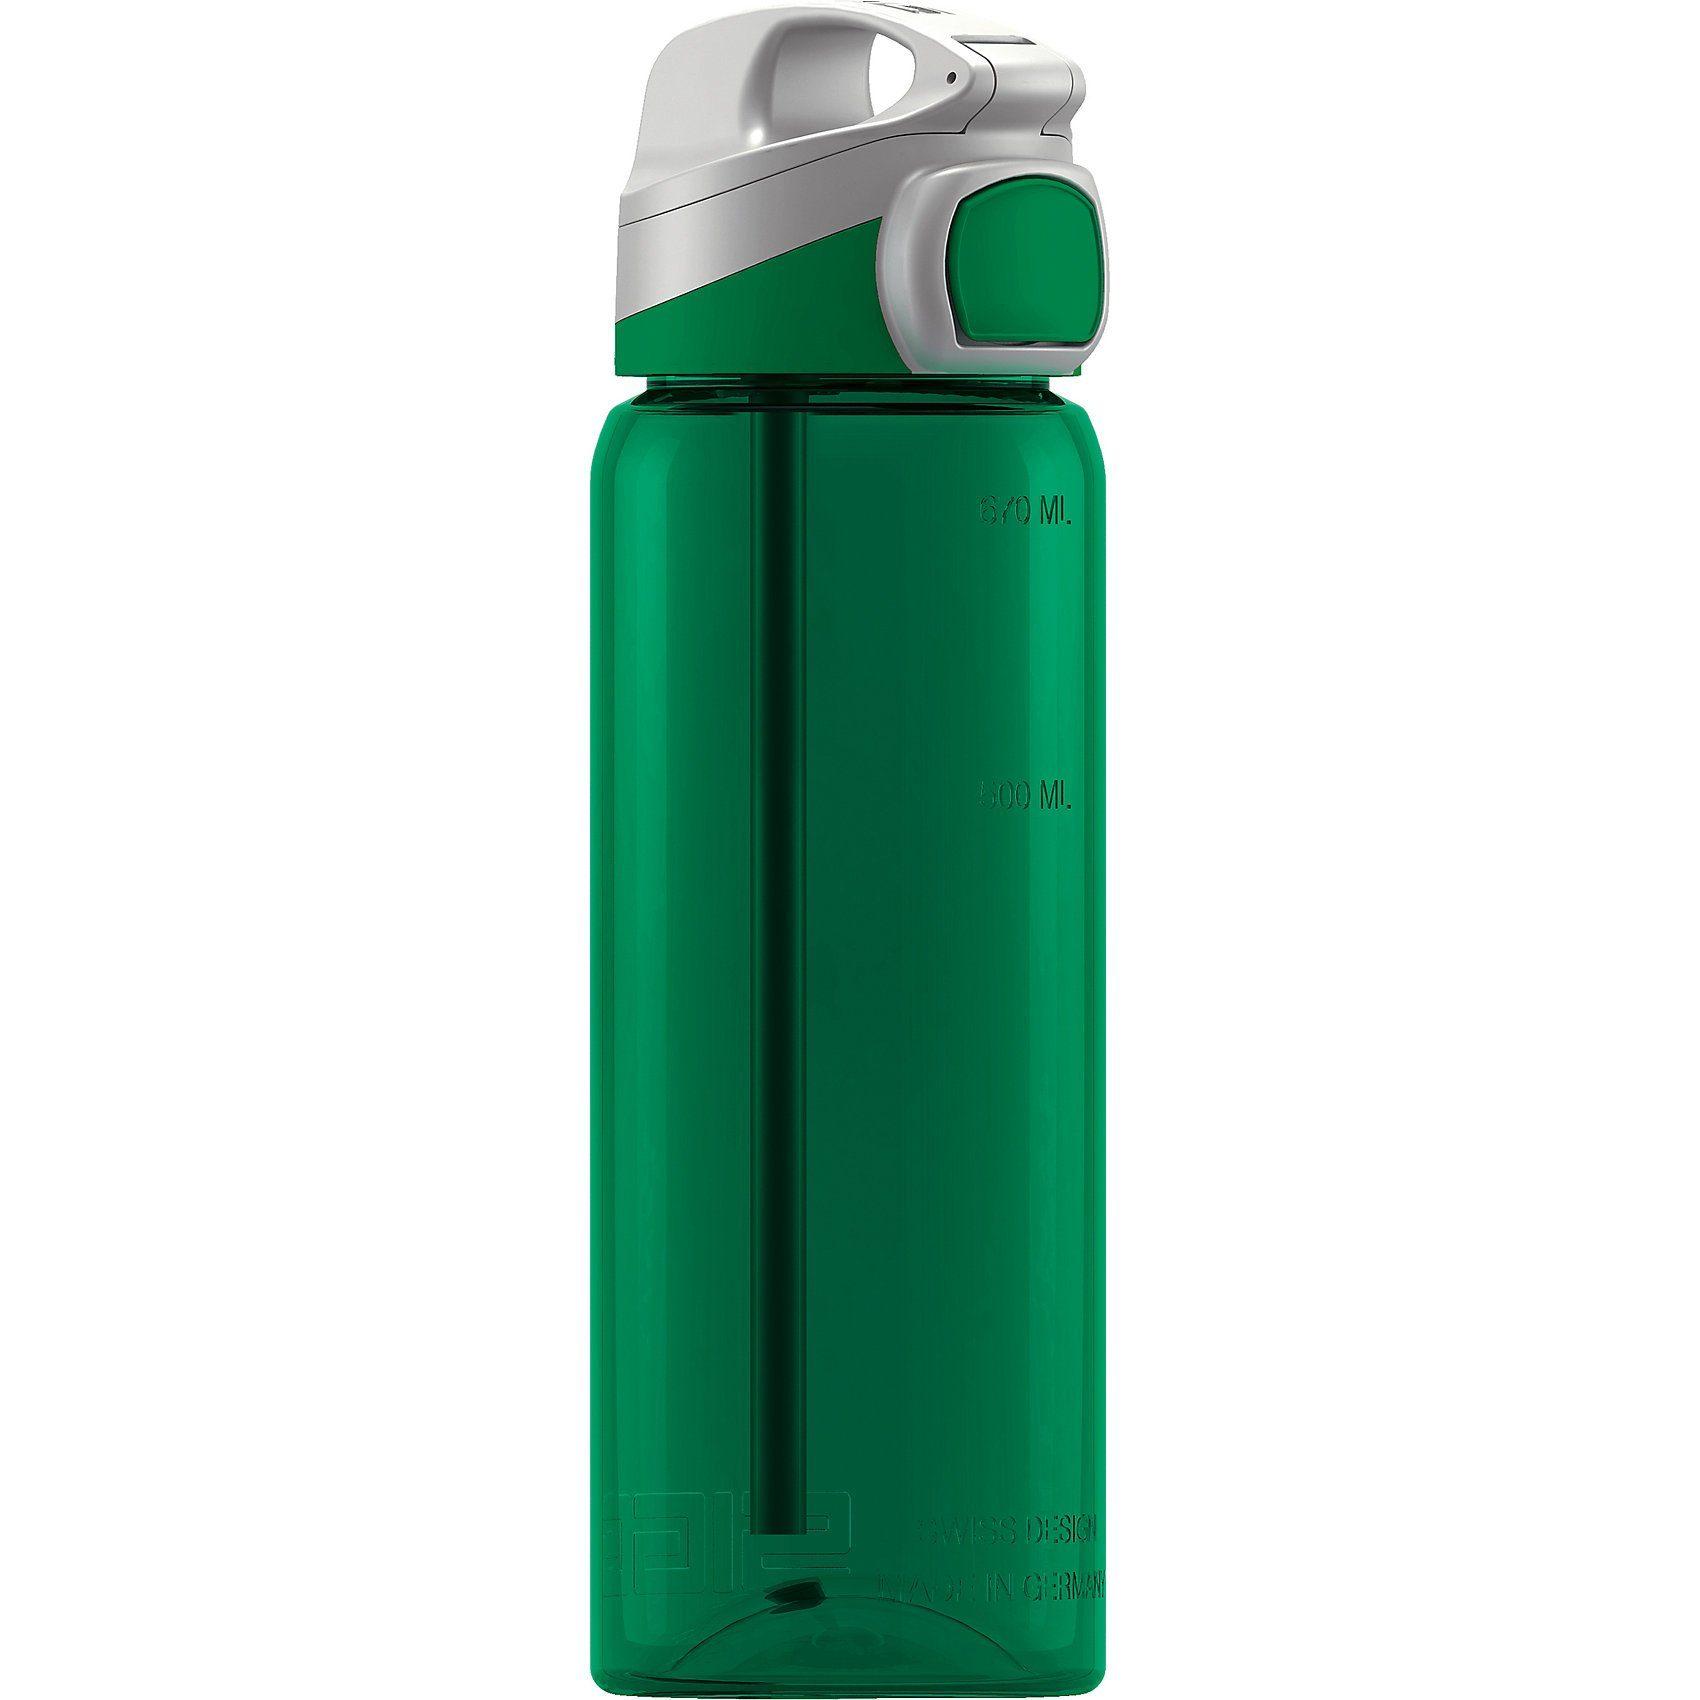 Sigg Tritan-Trinkflasche MIRACLE Grün, 600 ml